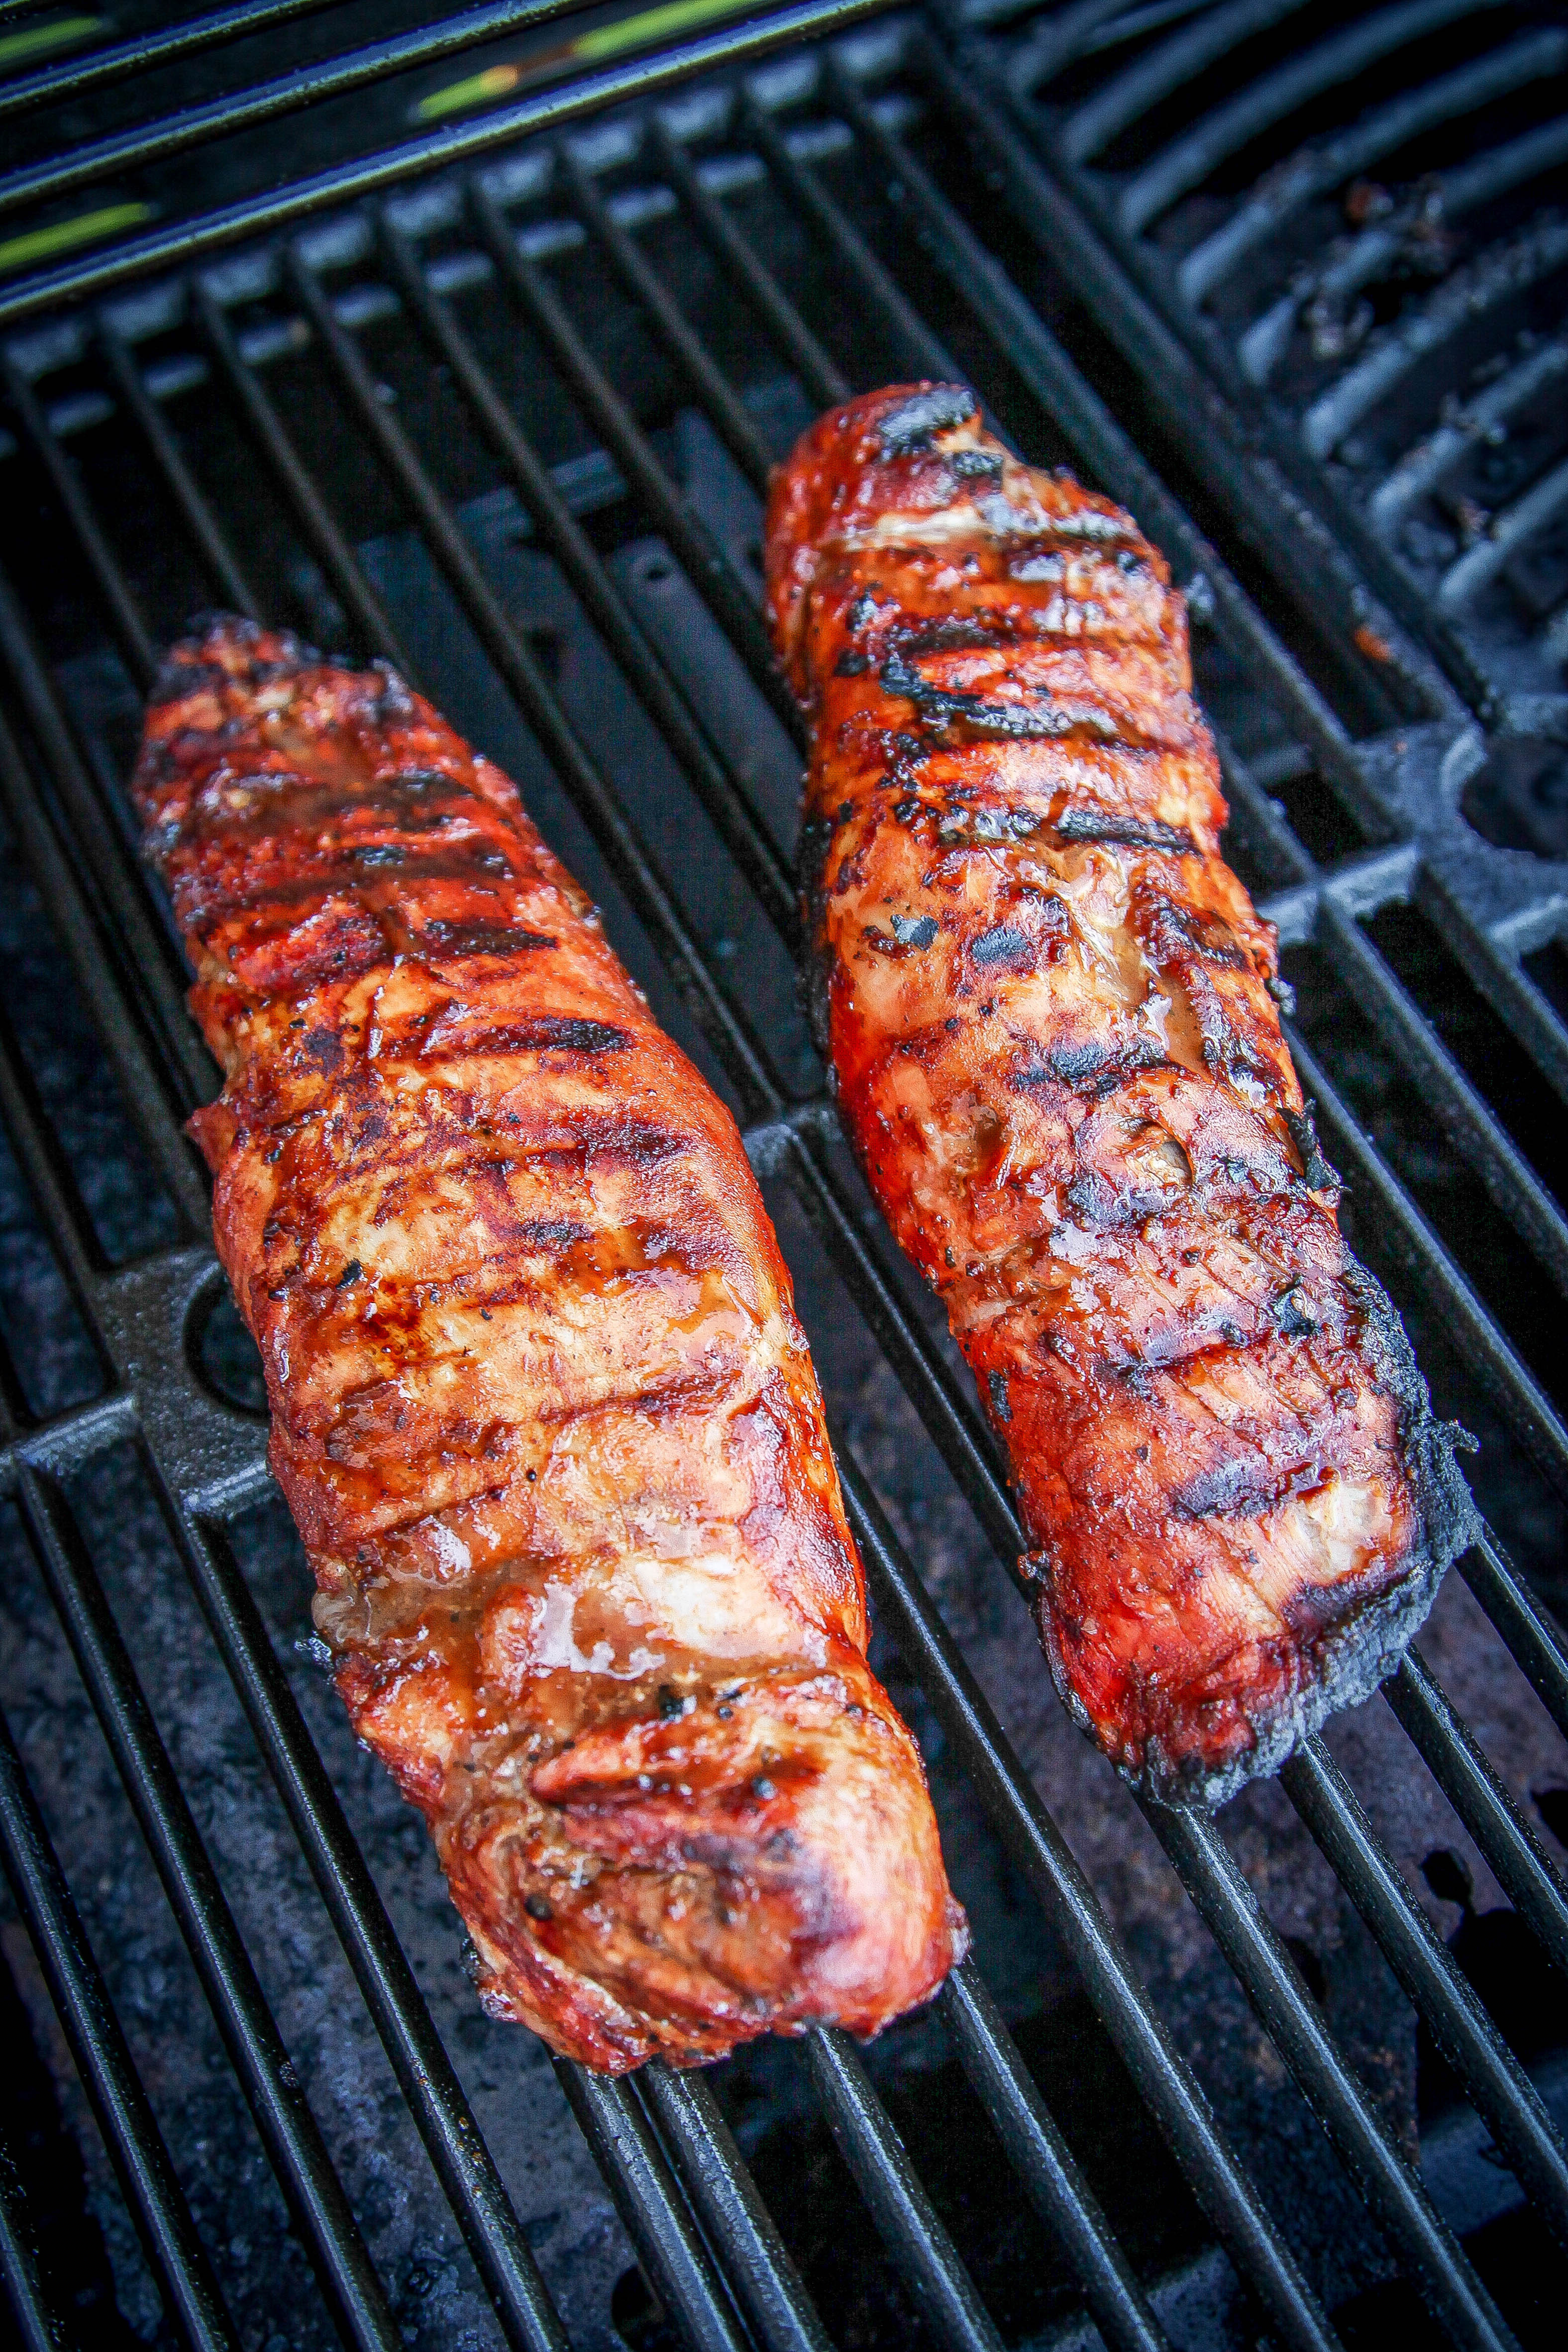 Pork Tenderloin On The Grill  Grilled BBQ Pork Tenderloin Recipe Baking Beauty